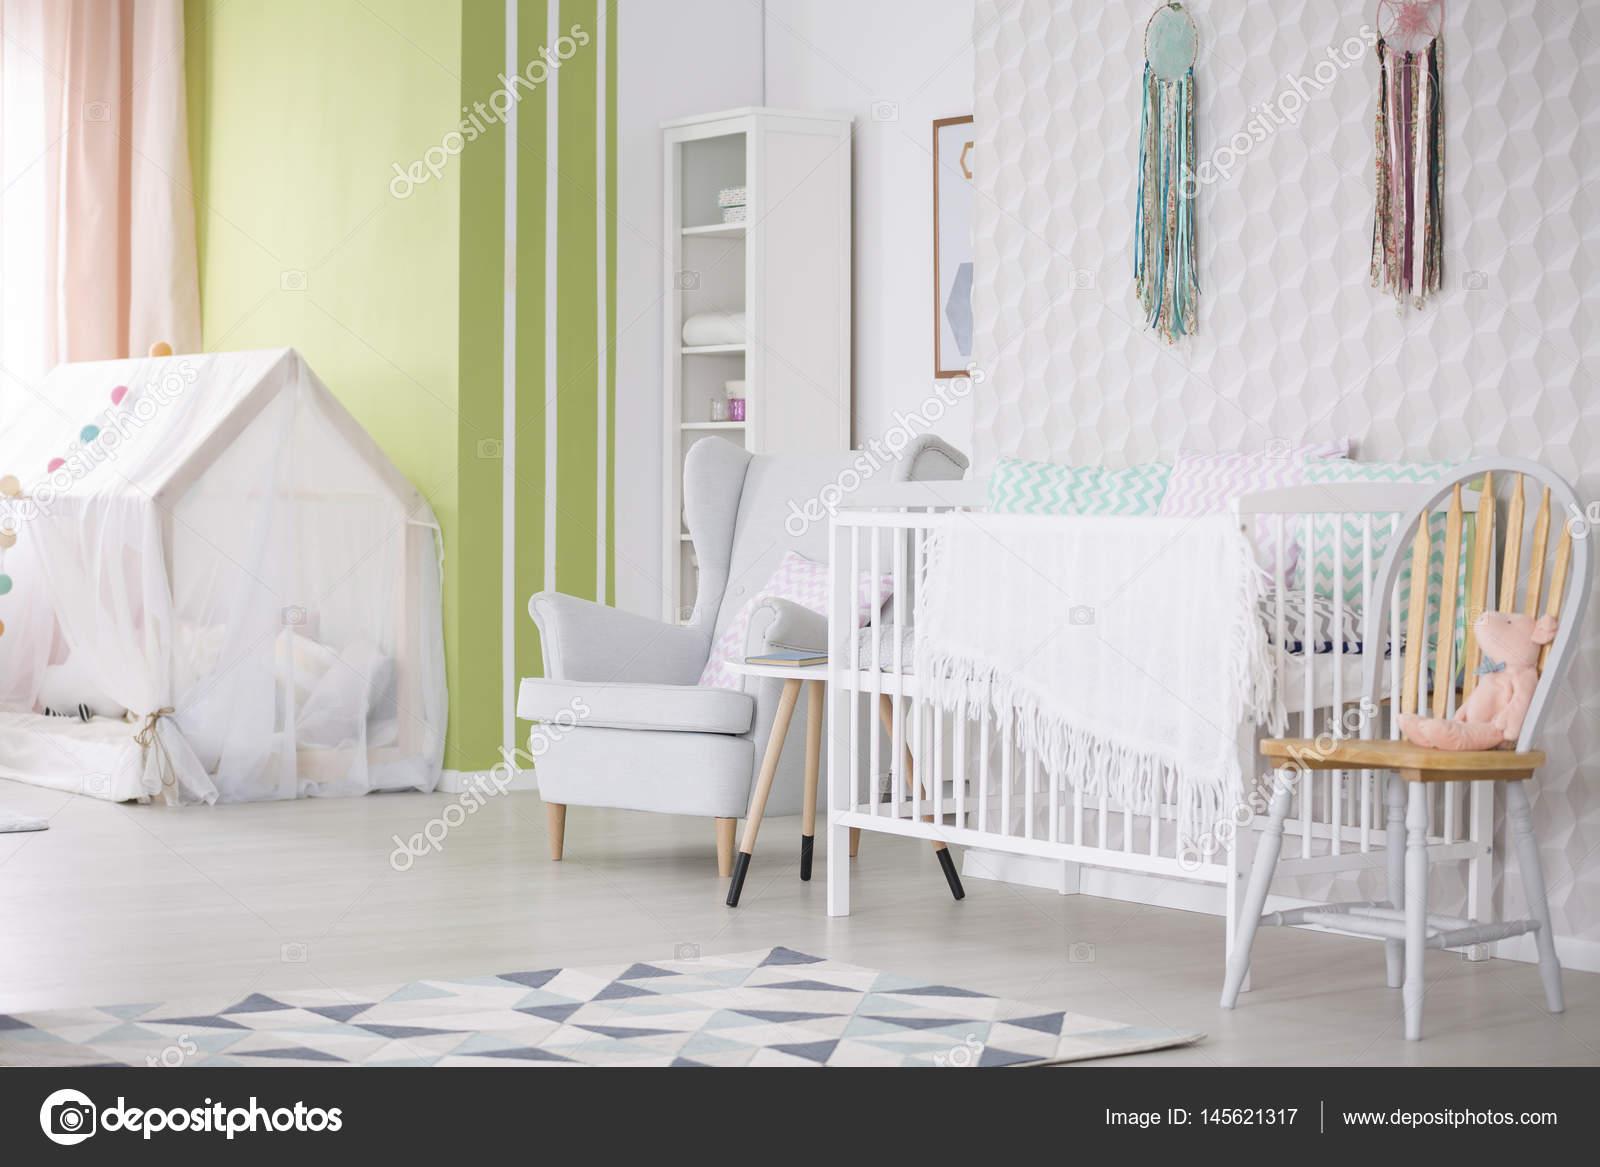 Stockfoto Babyzimmer Krippe Stuhlsessel Und Mit Photographee